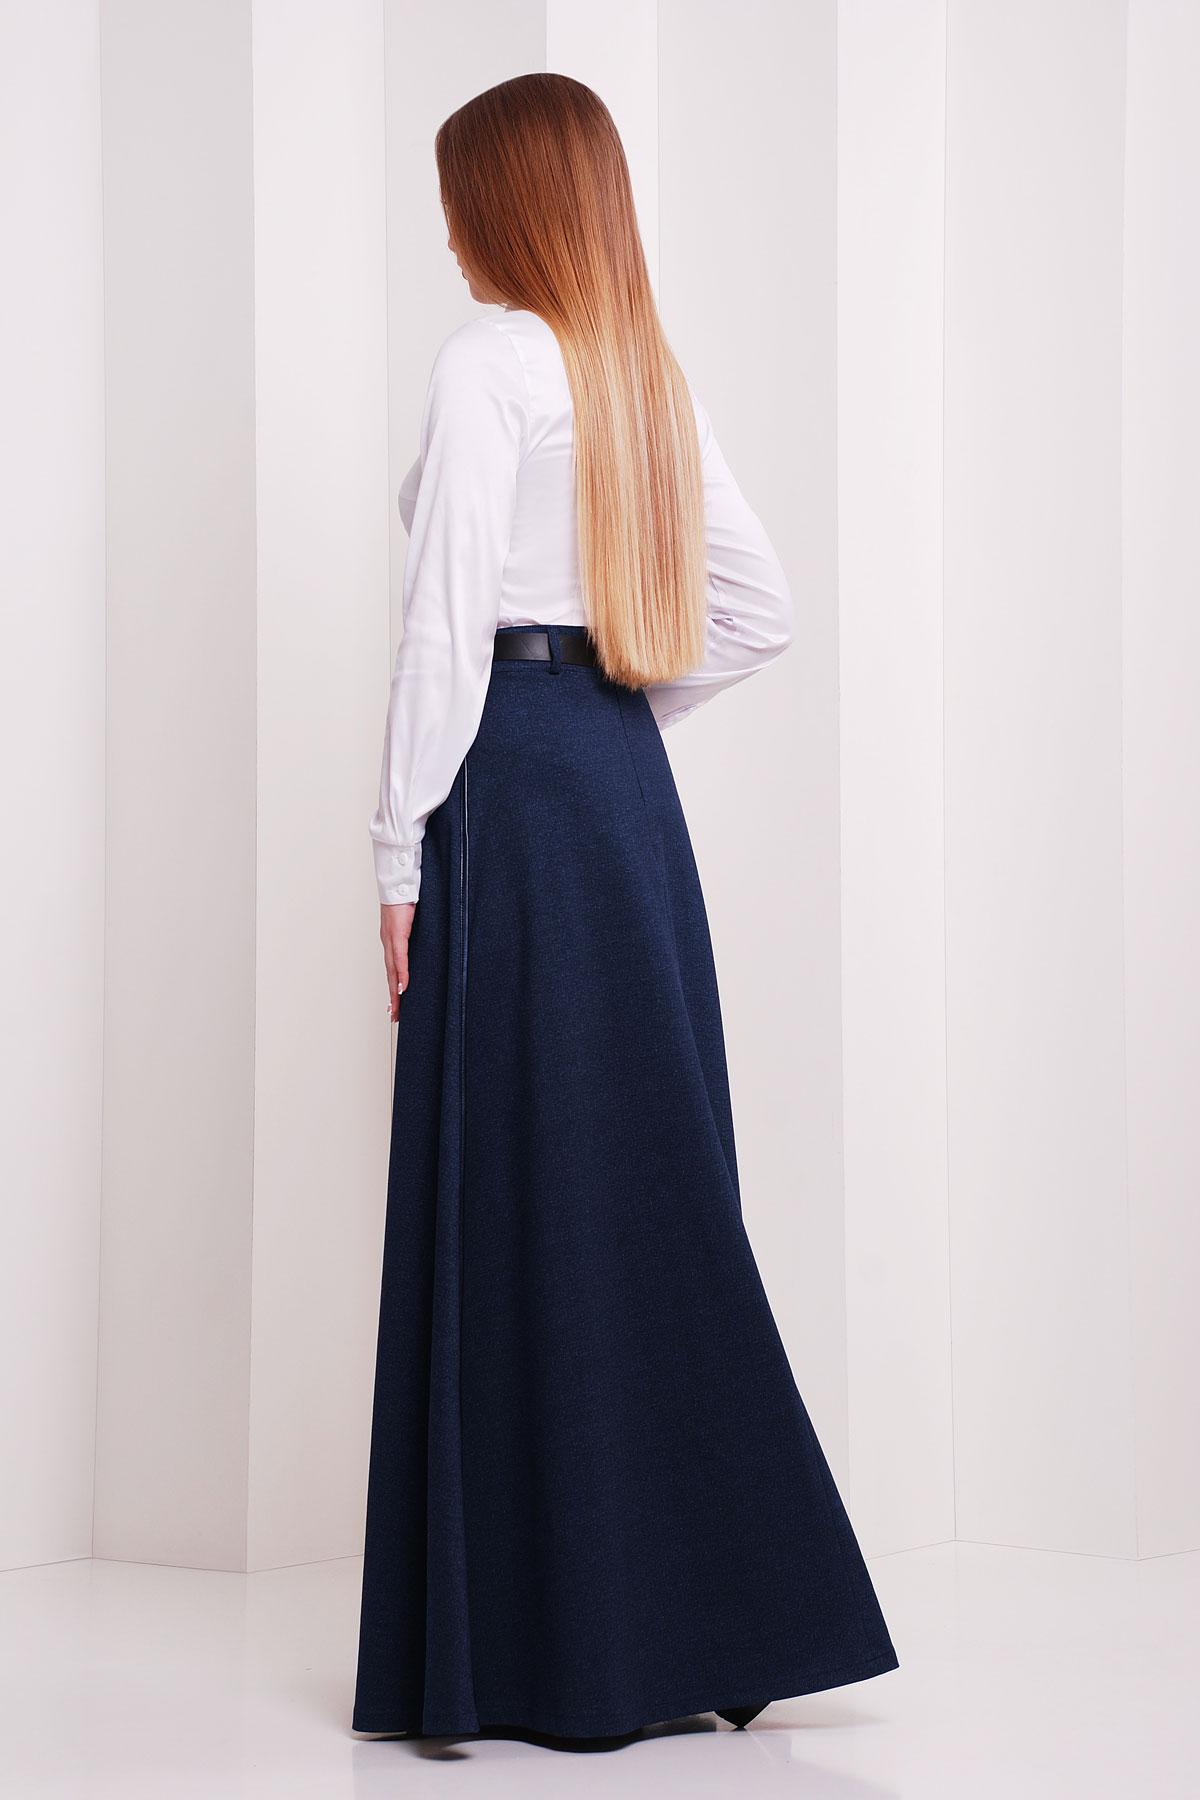 женская юбка-трапеция в пол. юбка мод. №24. Цвет: т.синий меланж